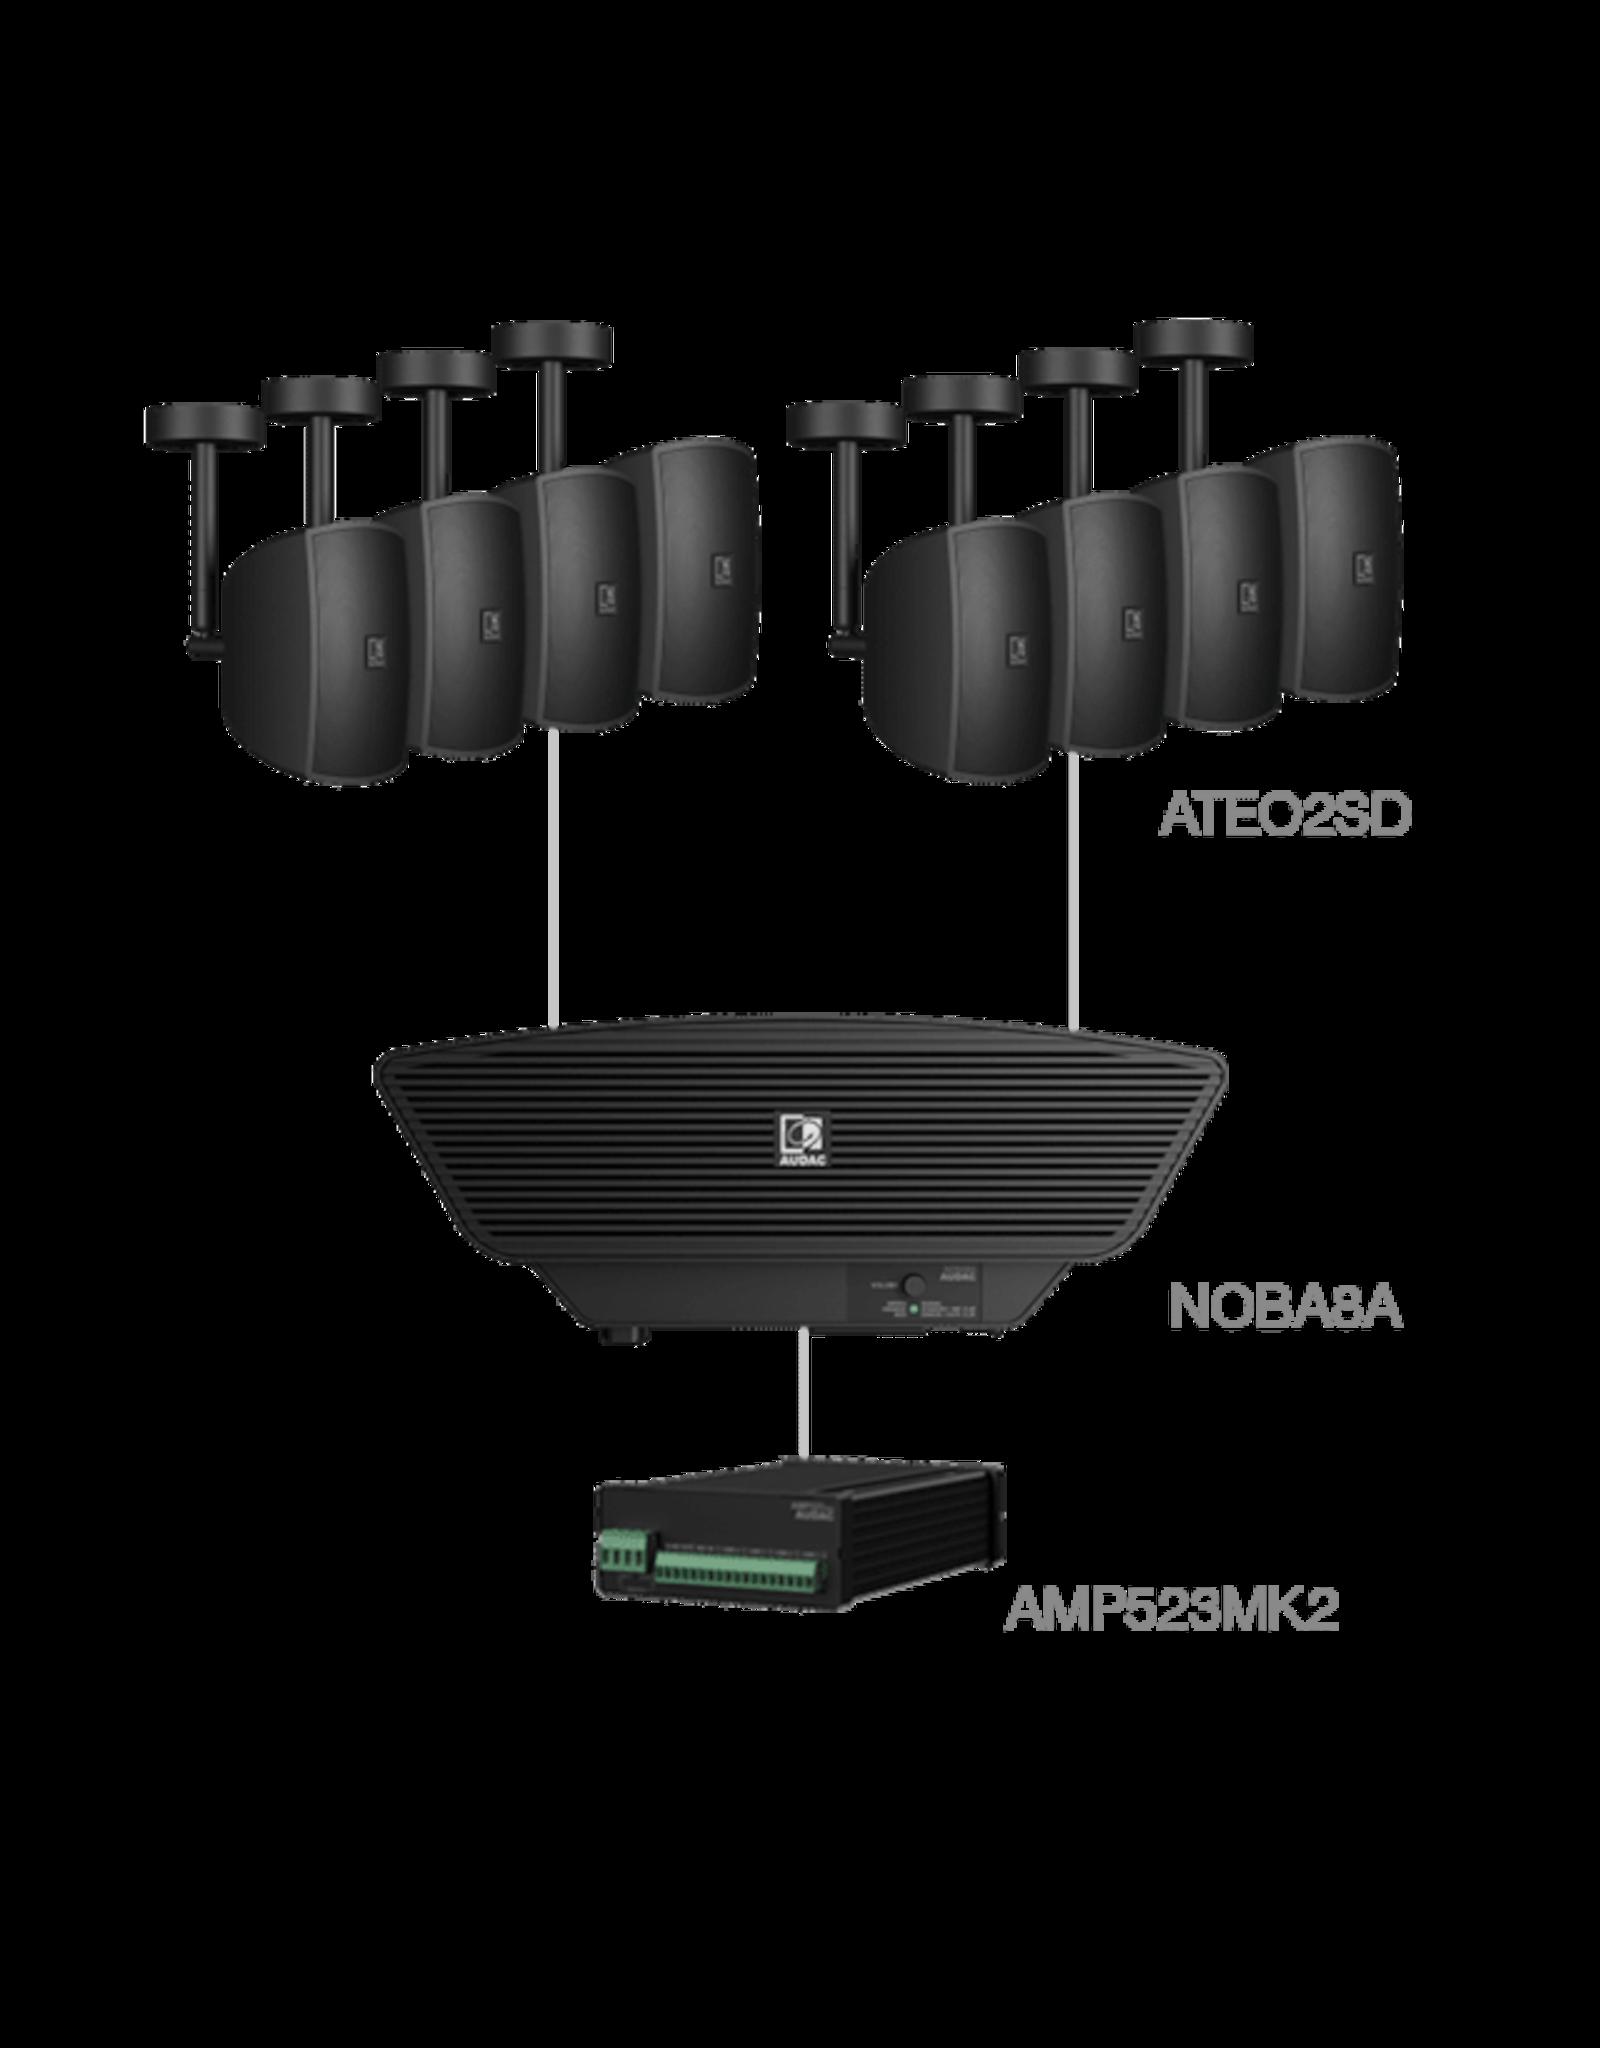 Audac 8x ATEO2SD + NOBA8A + AMP523MK2 Black